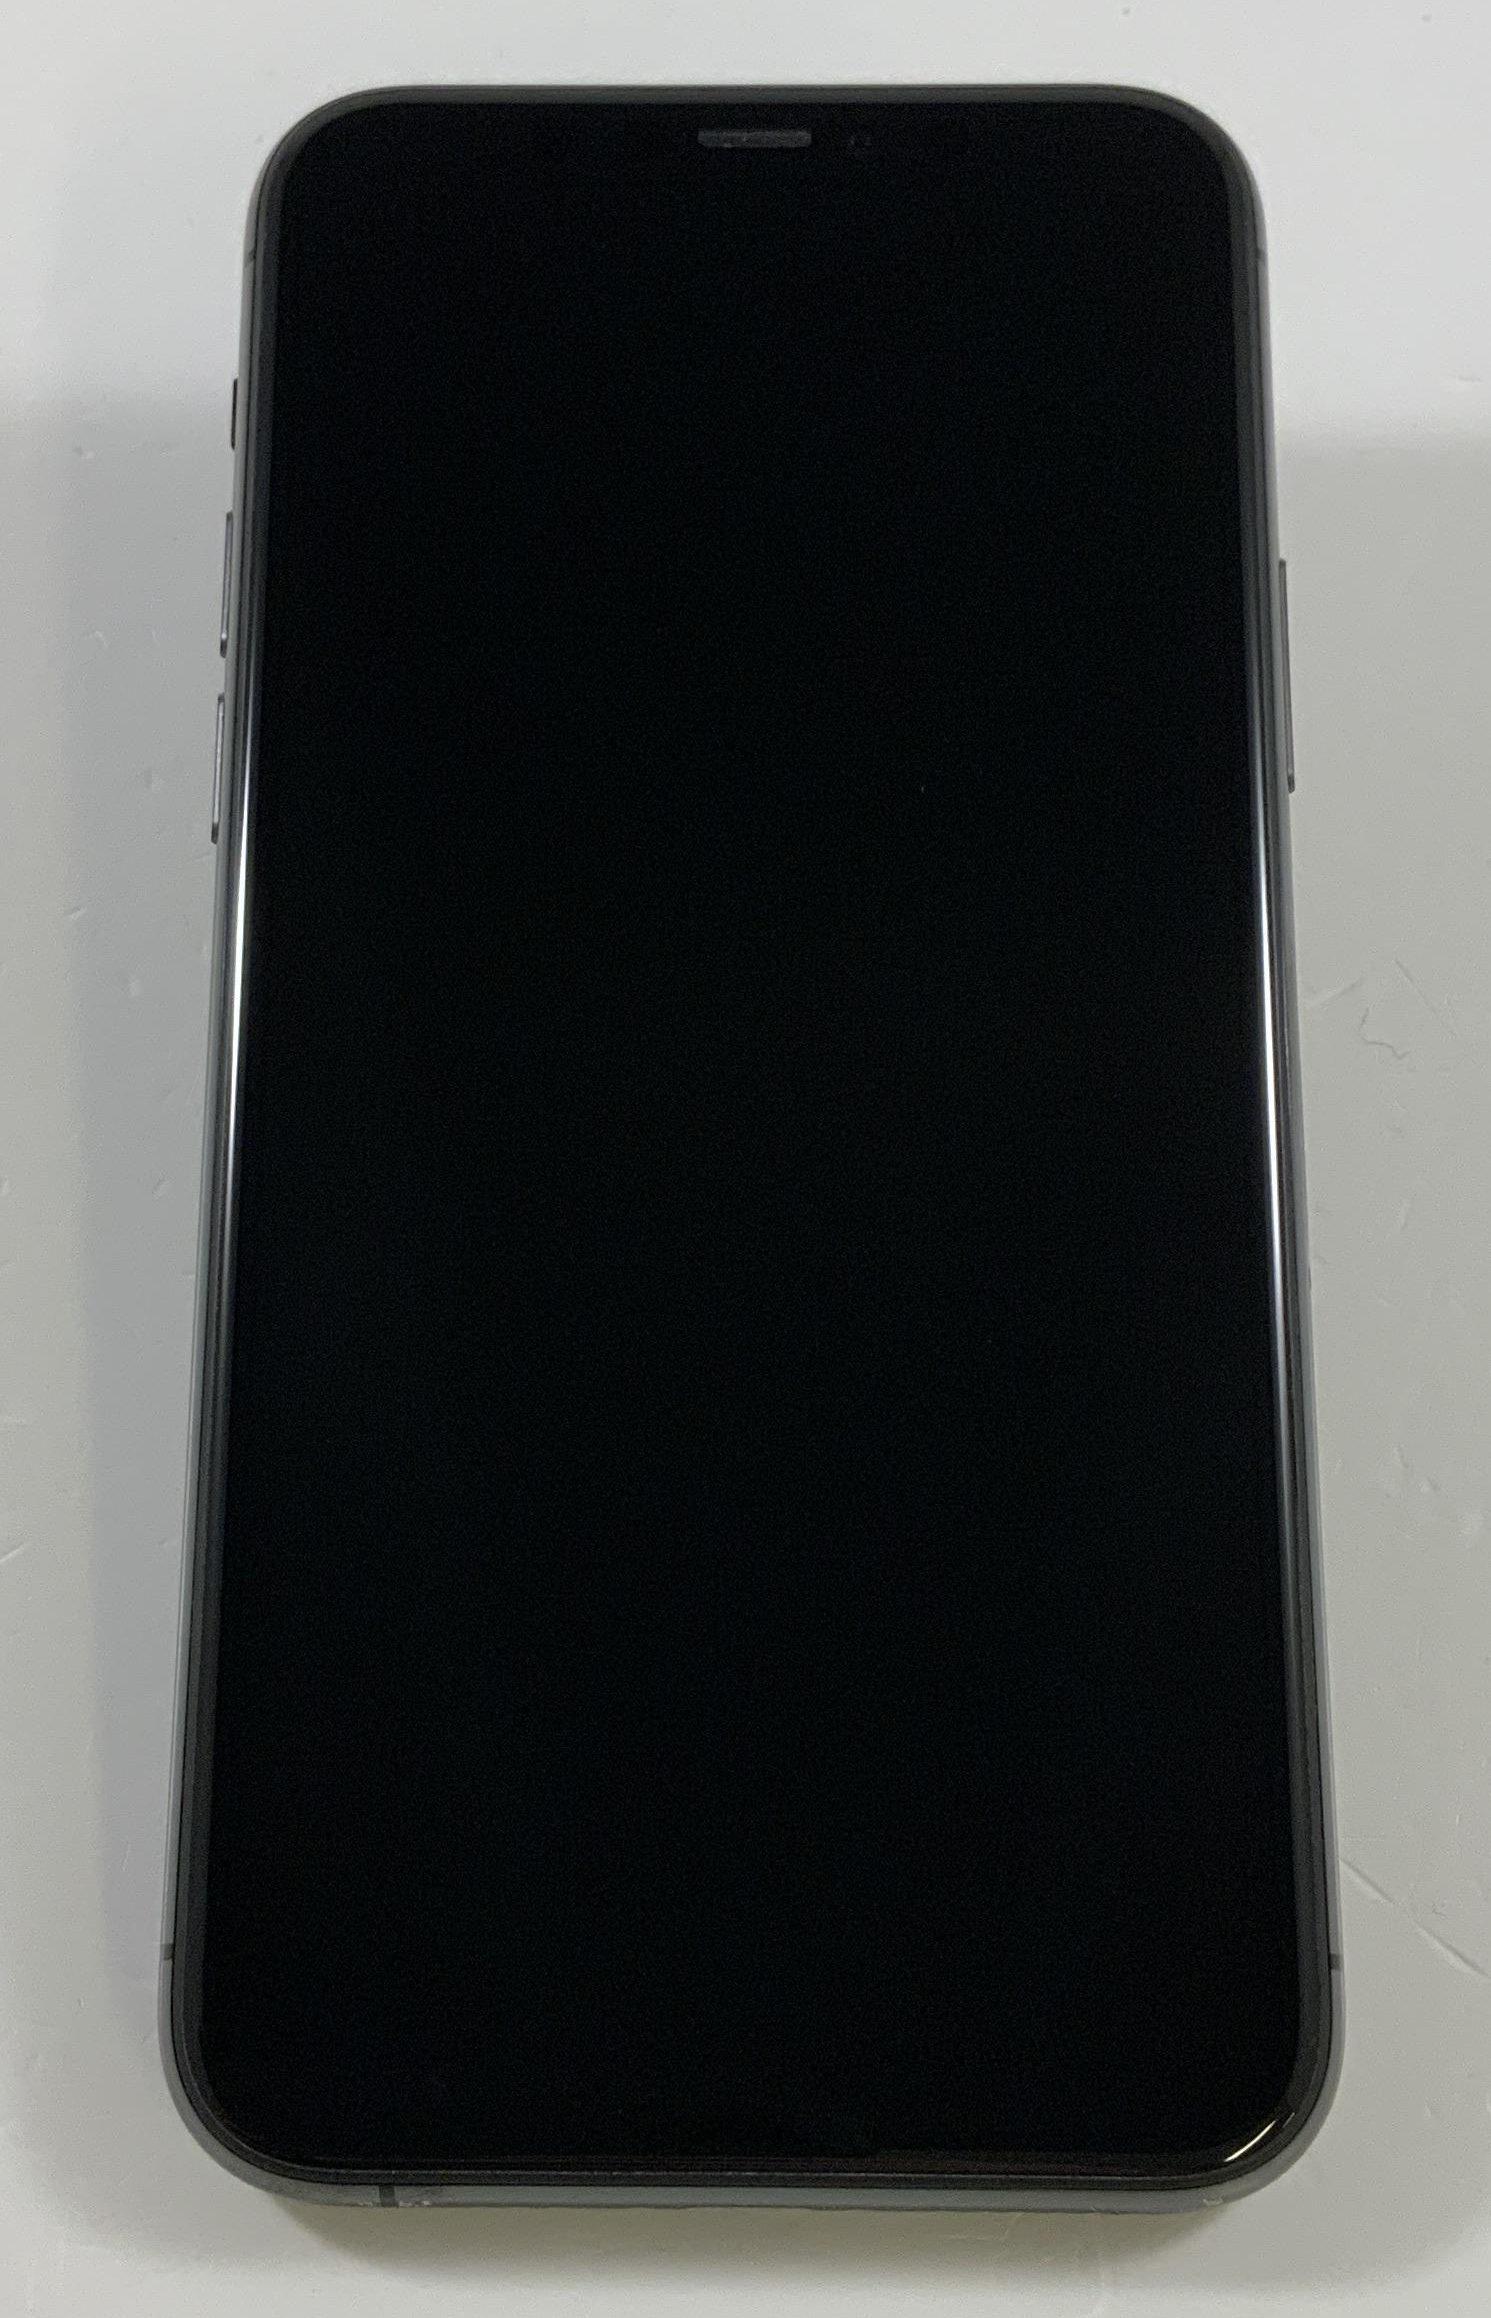 iPhone 11 Pro 64GB, 64GB, Space Gray, Afbeelding 1